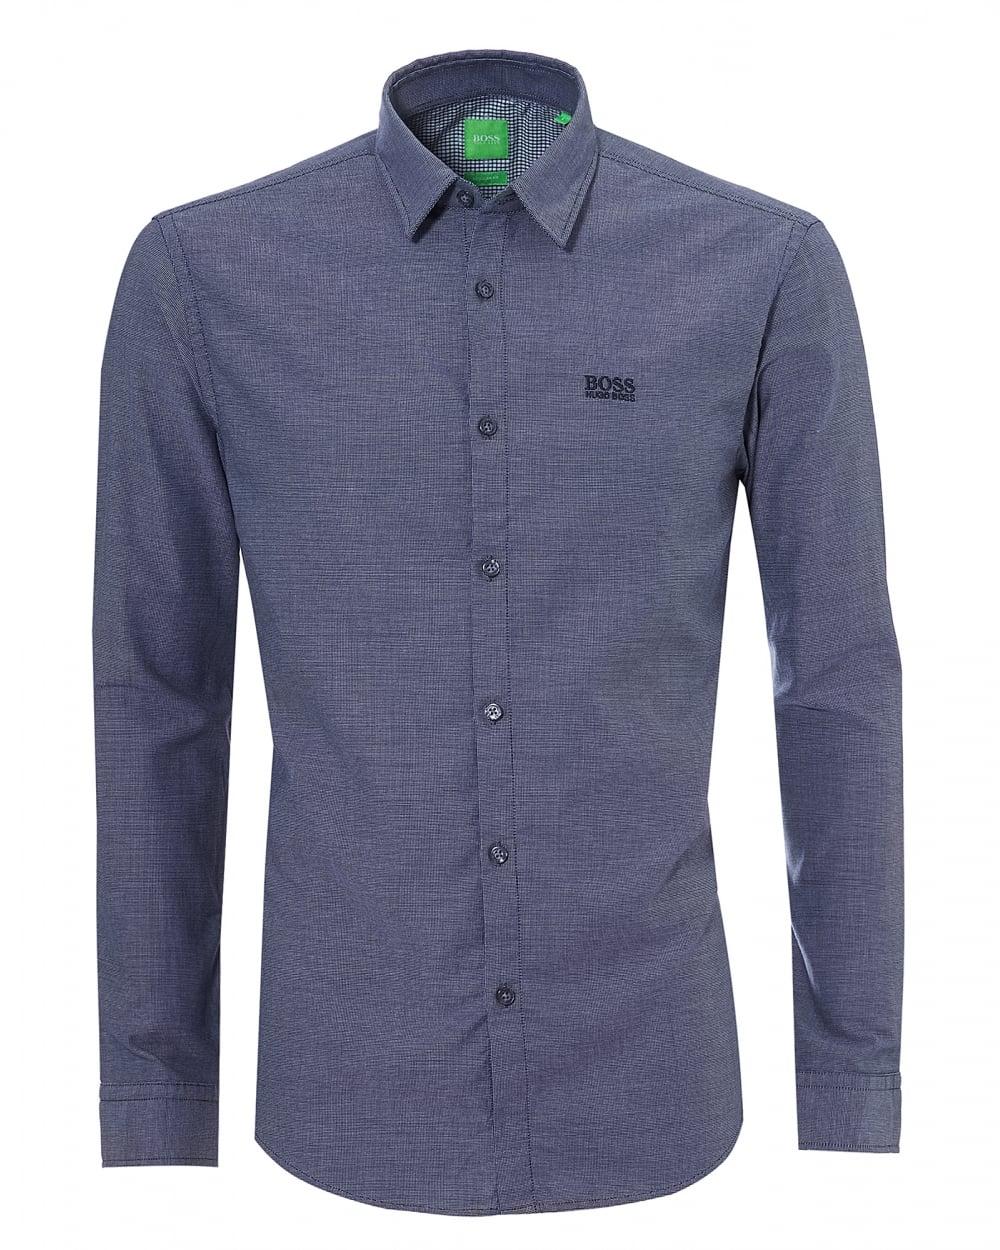 838eaf34fcb Hugo Boss Green Mens C-Buster R Pin Dot Check Navy Blue Shirt